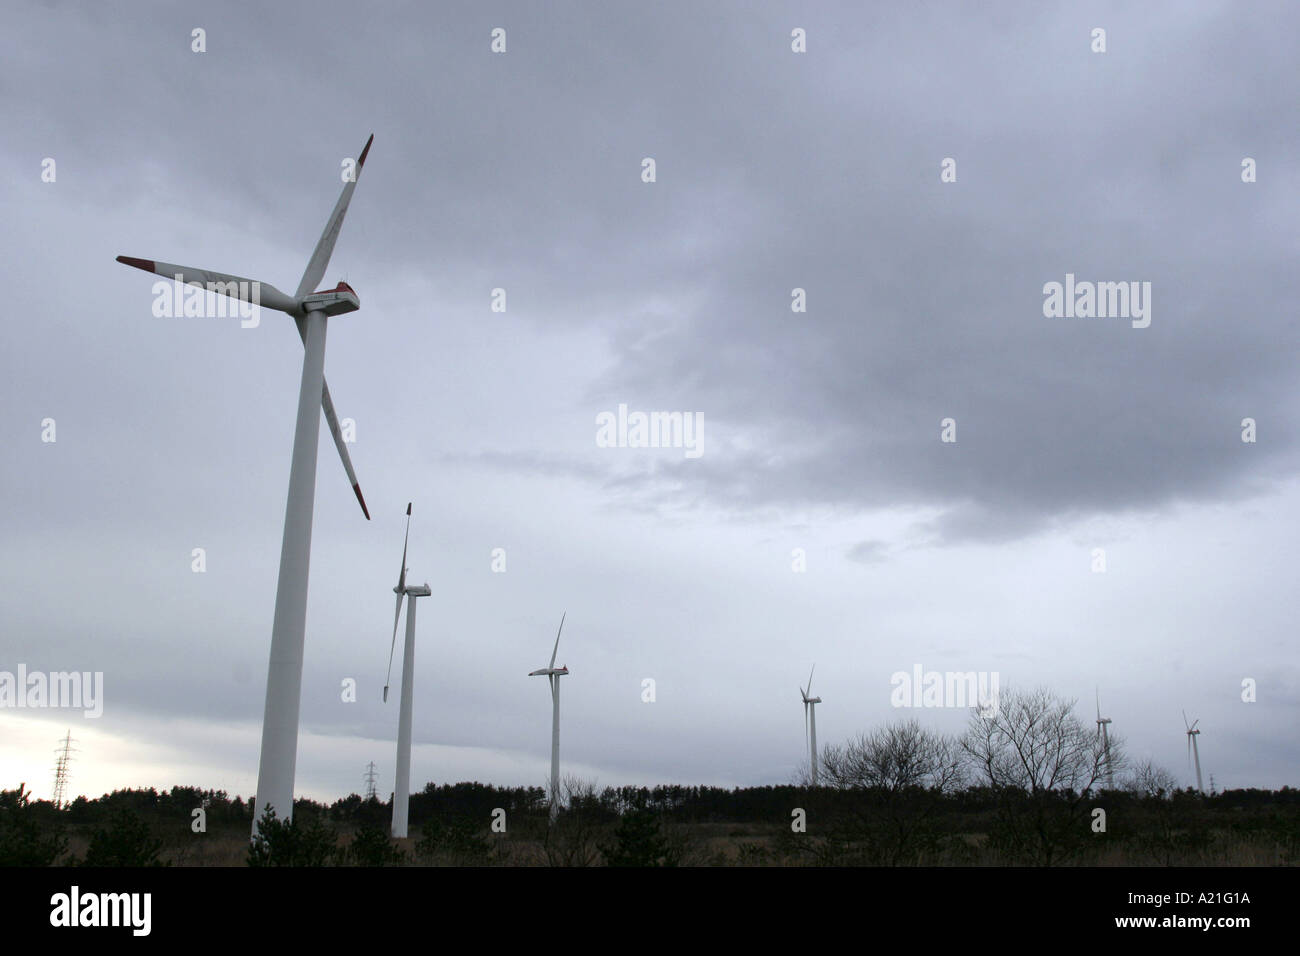 Wind Turbines on a landscape near Rokkosho Northern Japan generating renewable green environmentally friendly energy - Stock Image